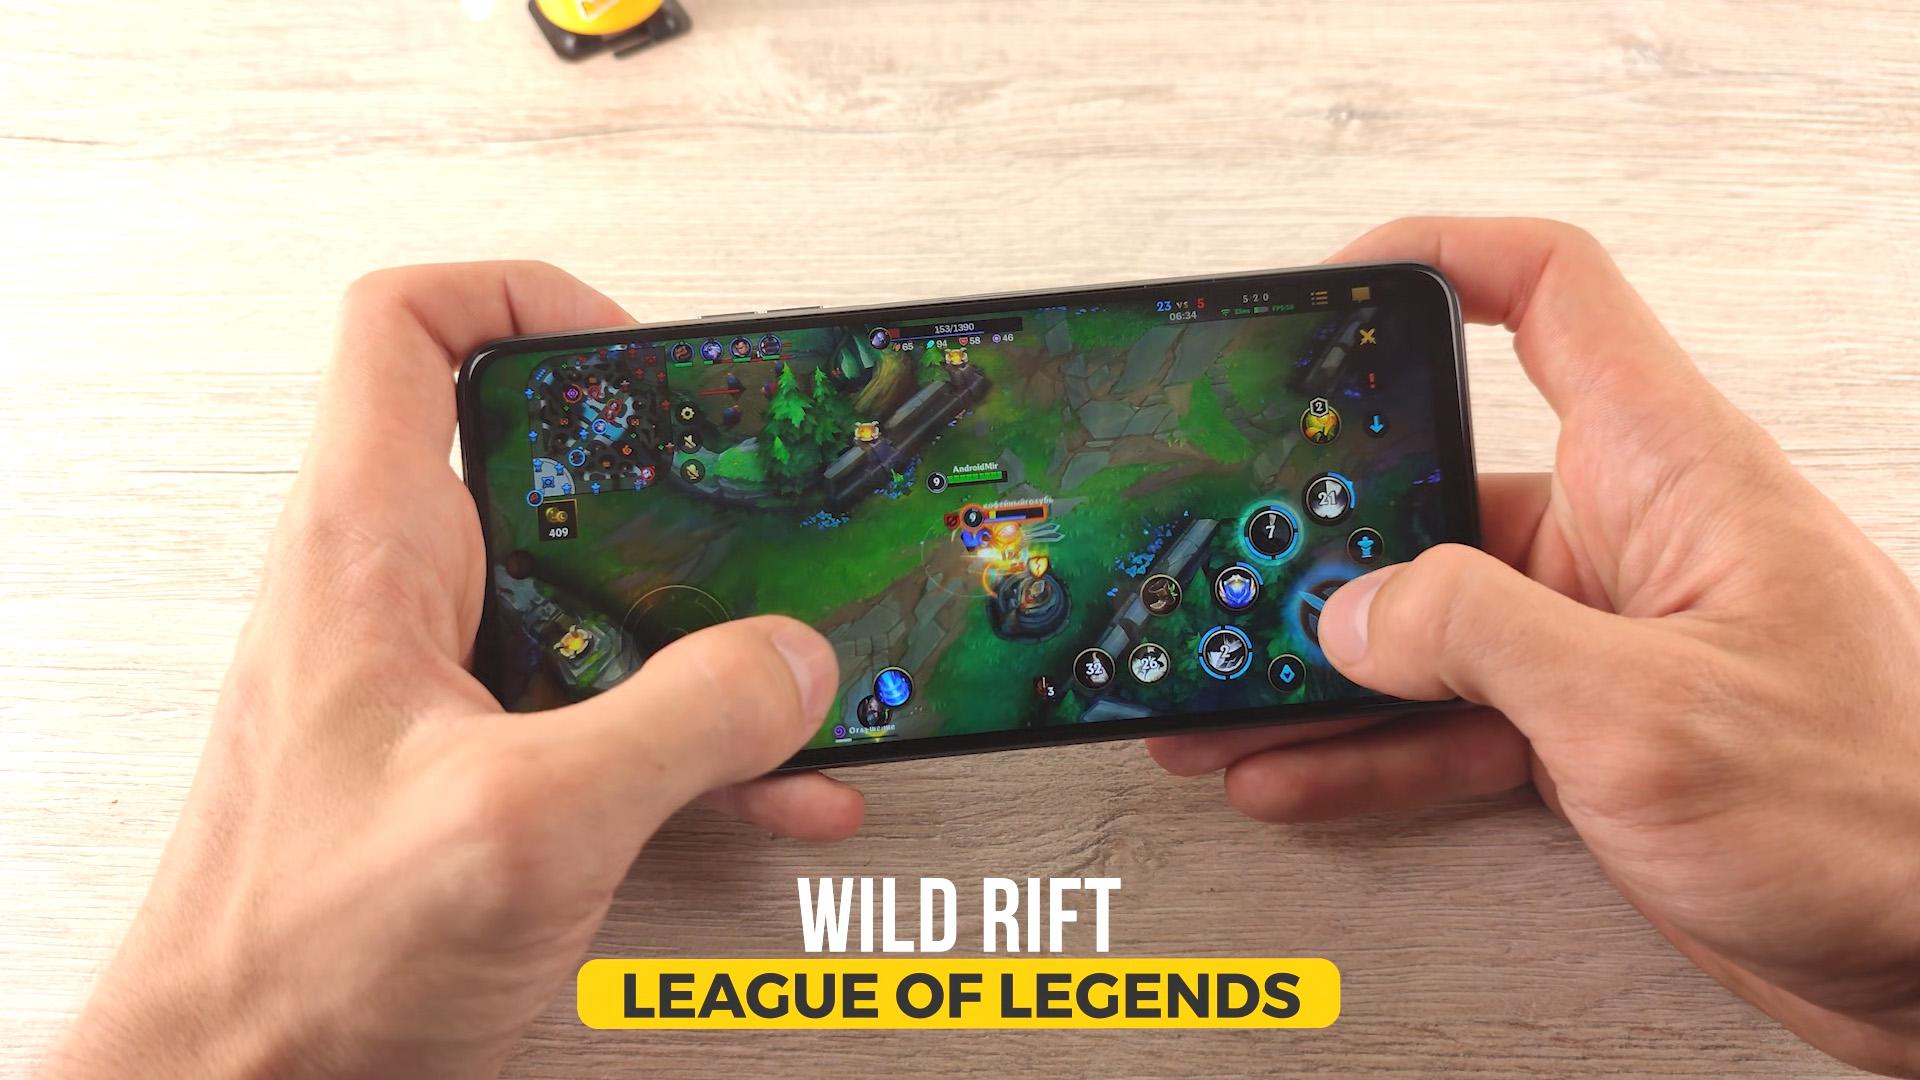 Tecno Camon 17P геймплей gameplay lol league of legends wild rift вайлд рифт